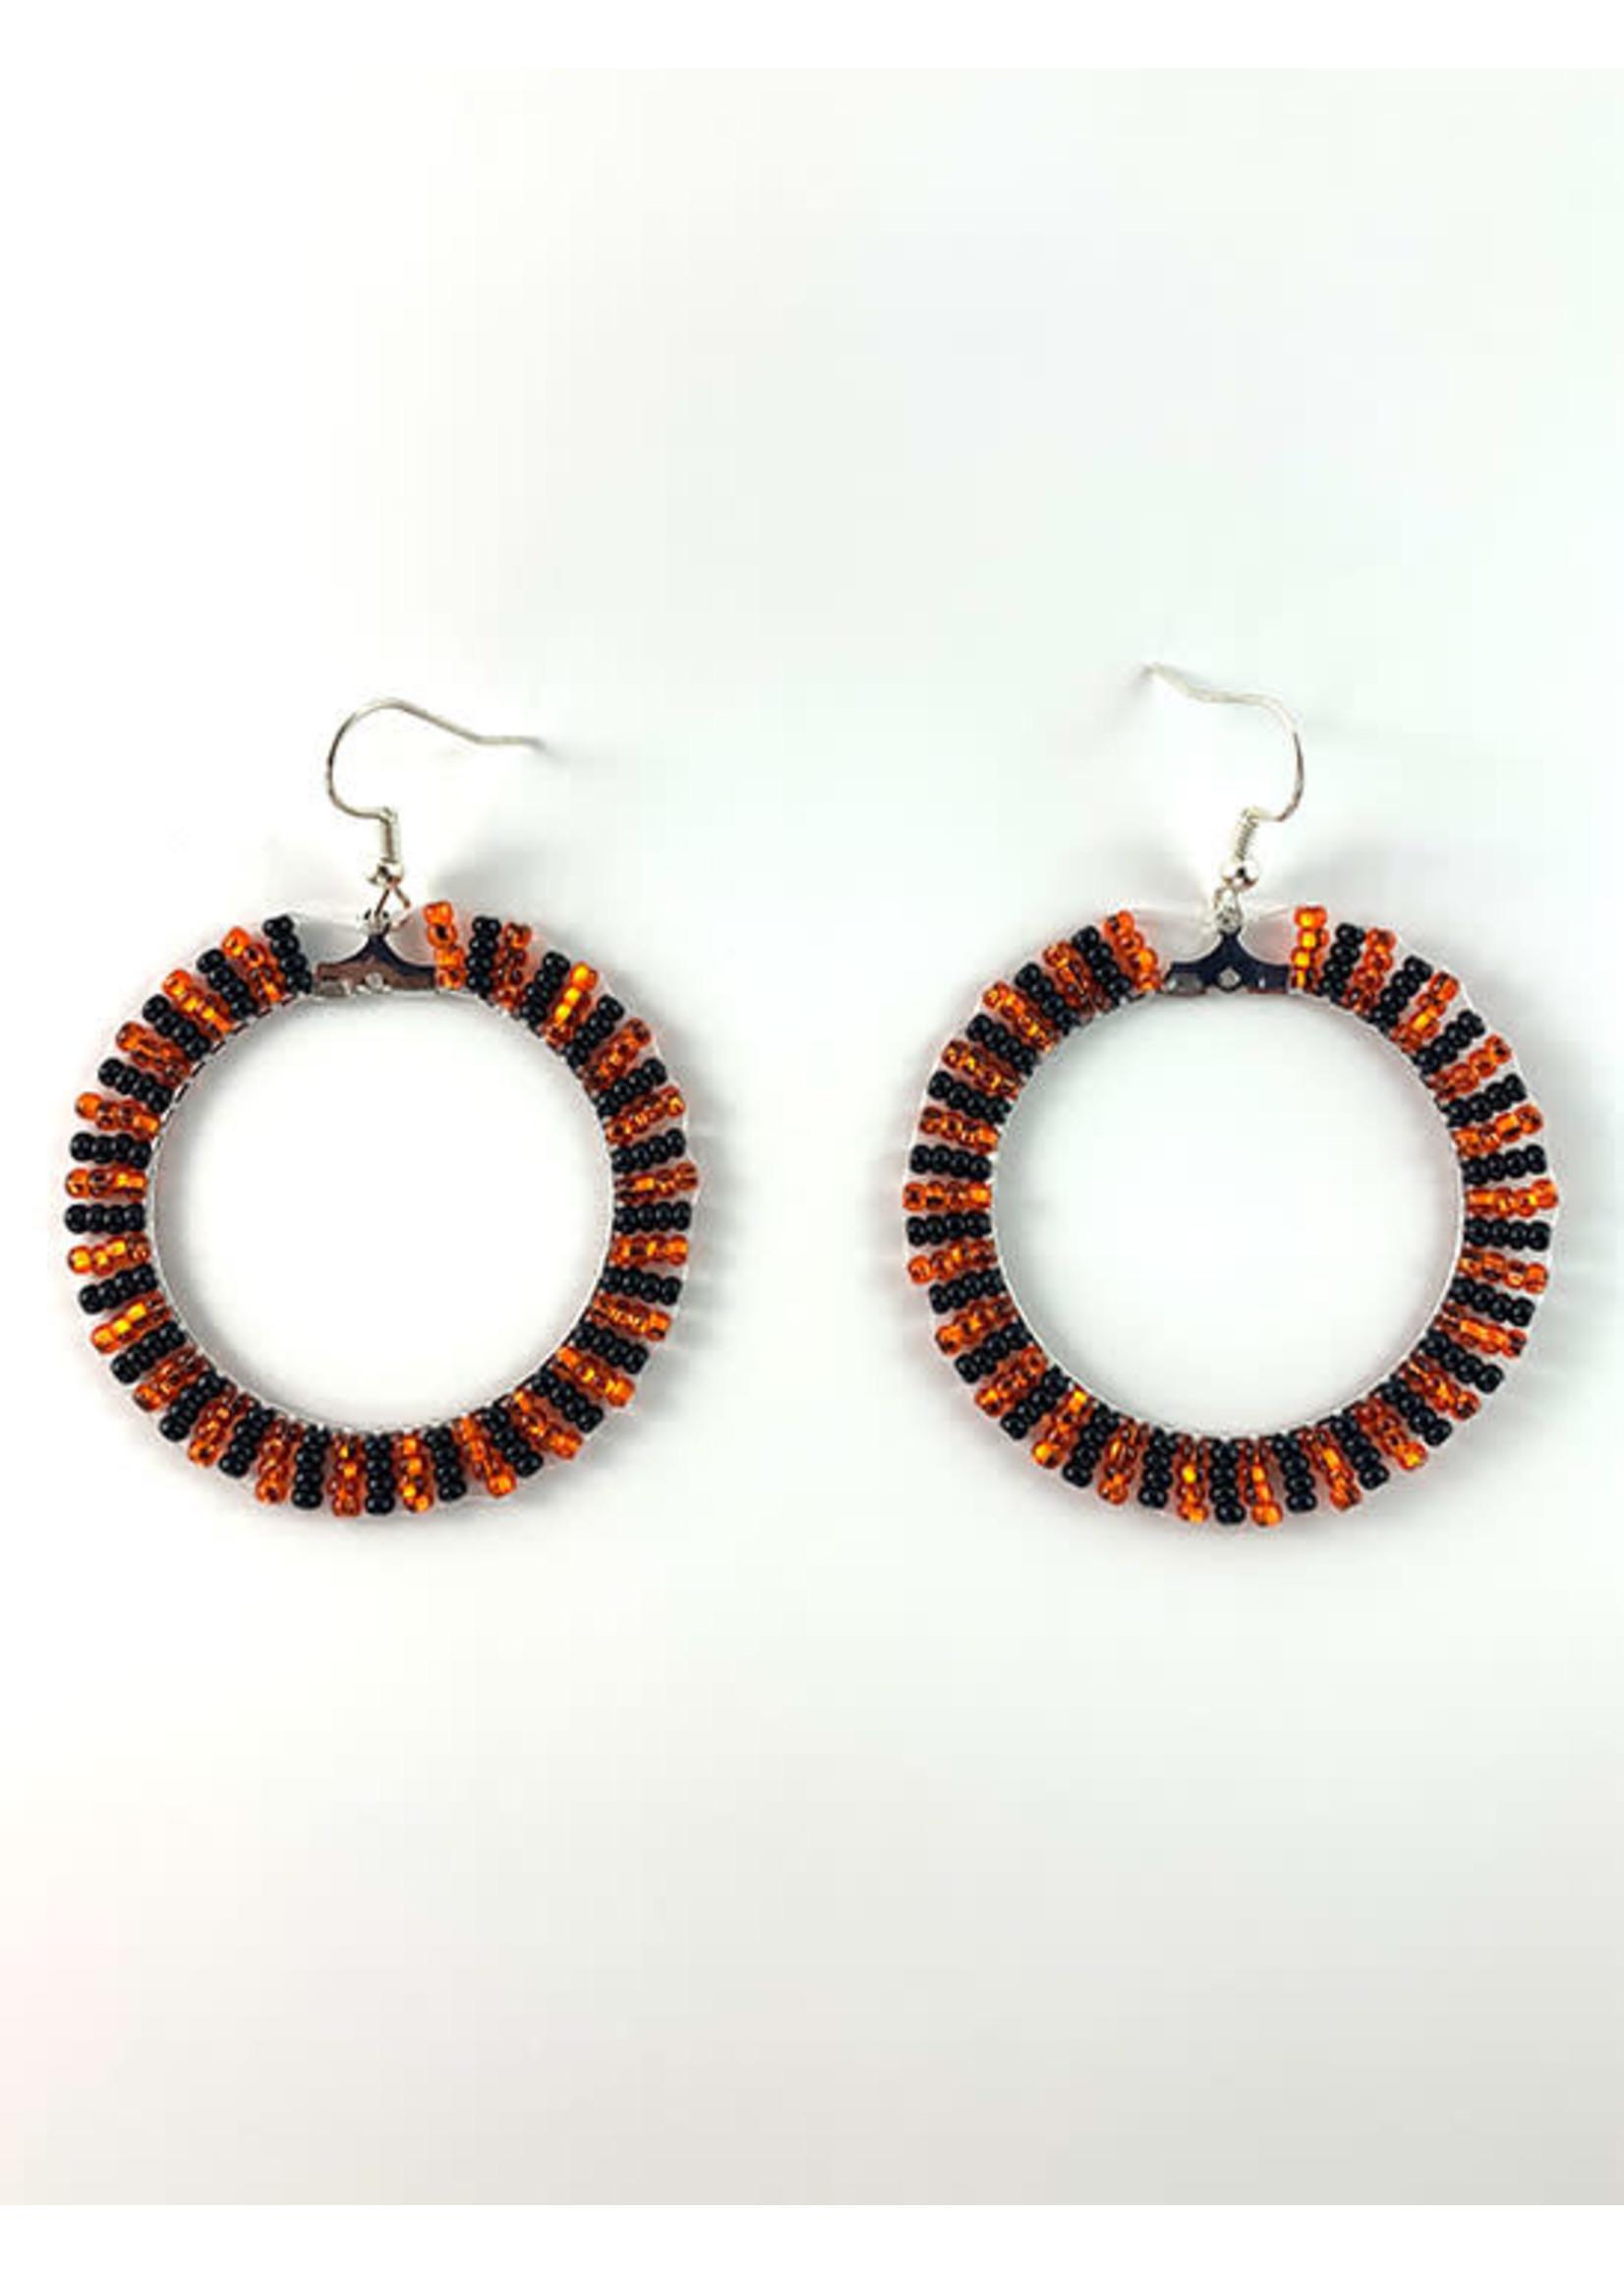 Beaded Earrings Hoops Silver Lined Orange and Opaque Black